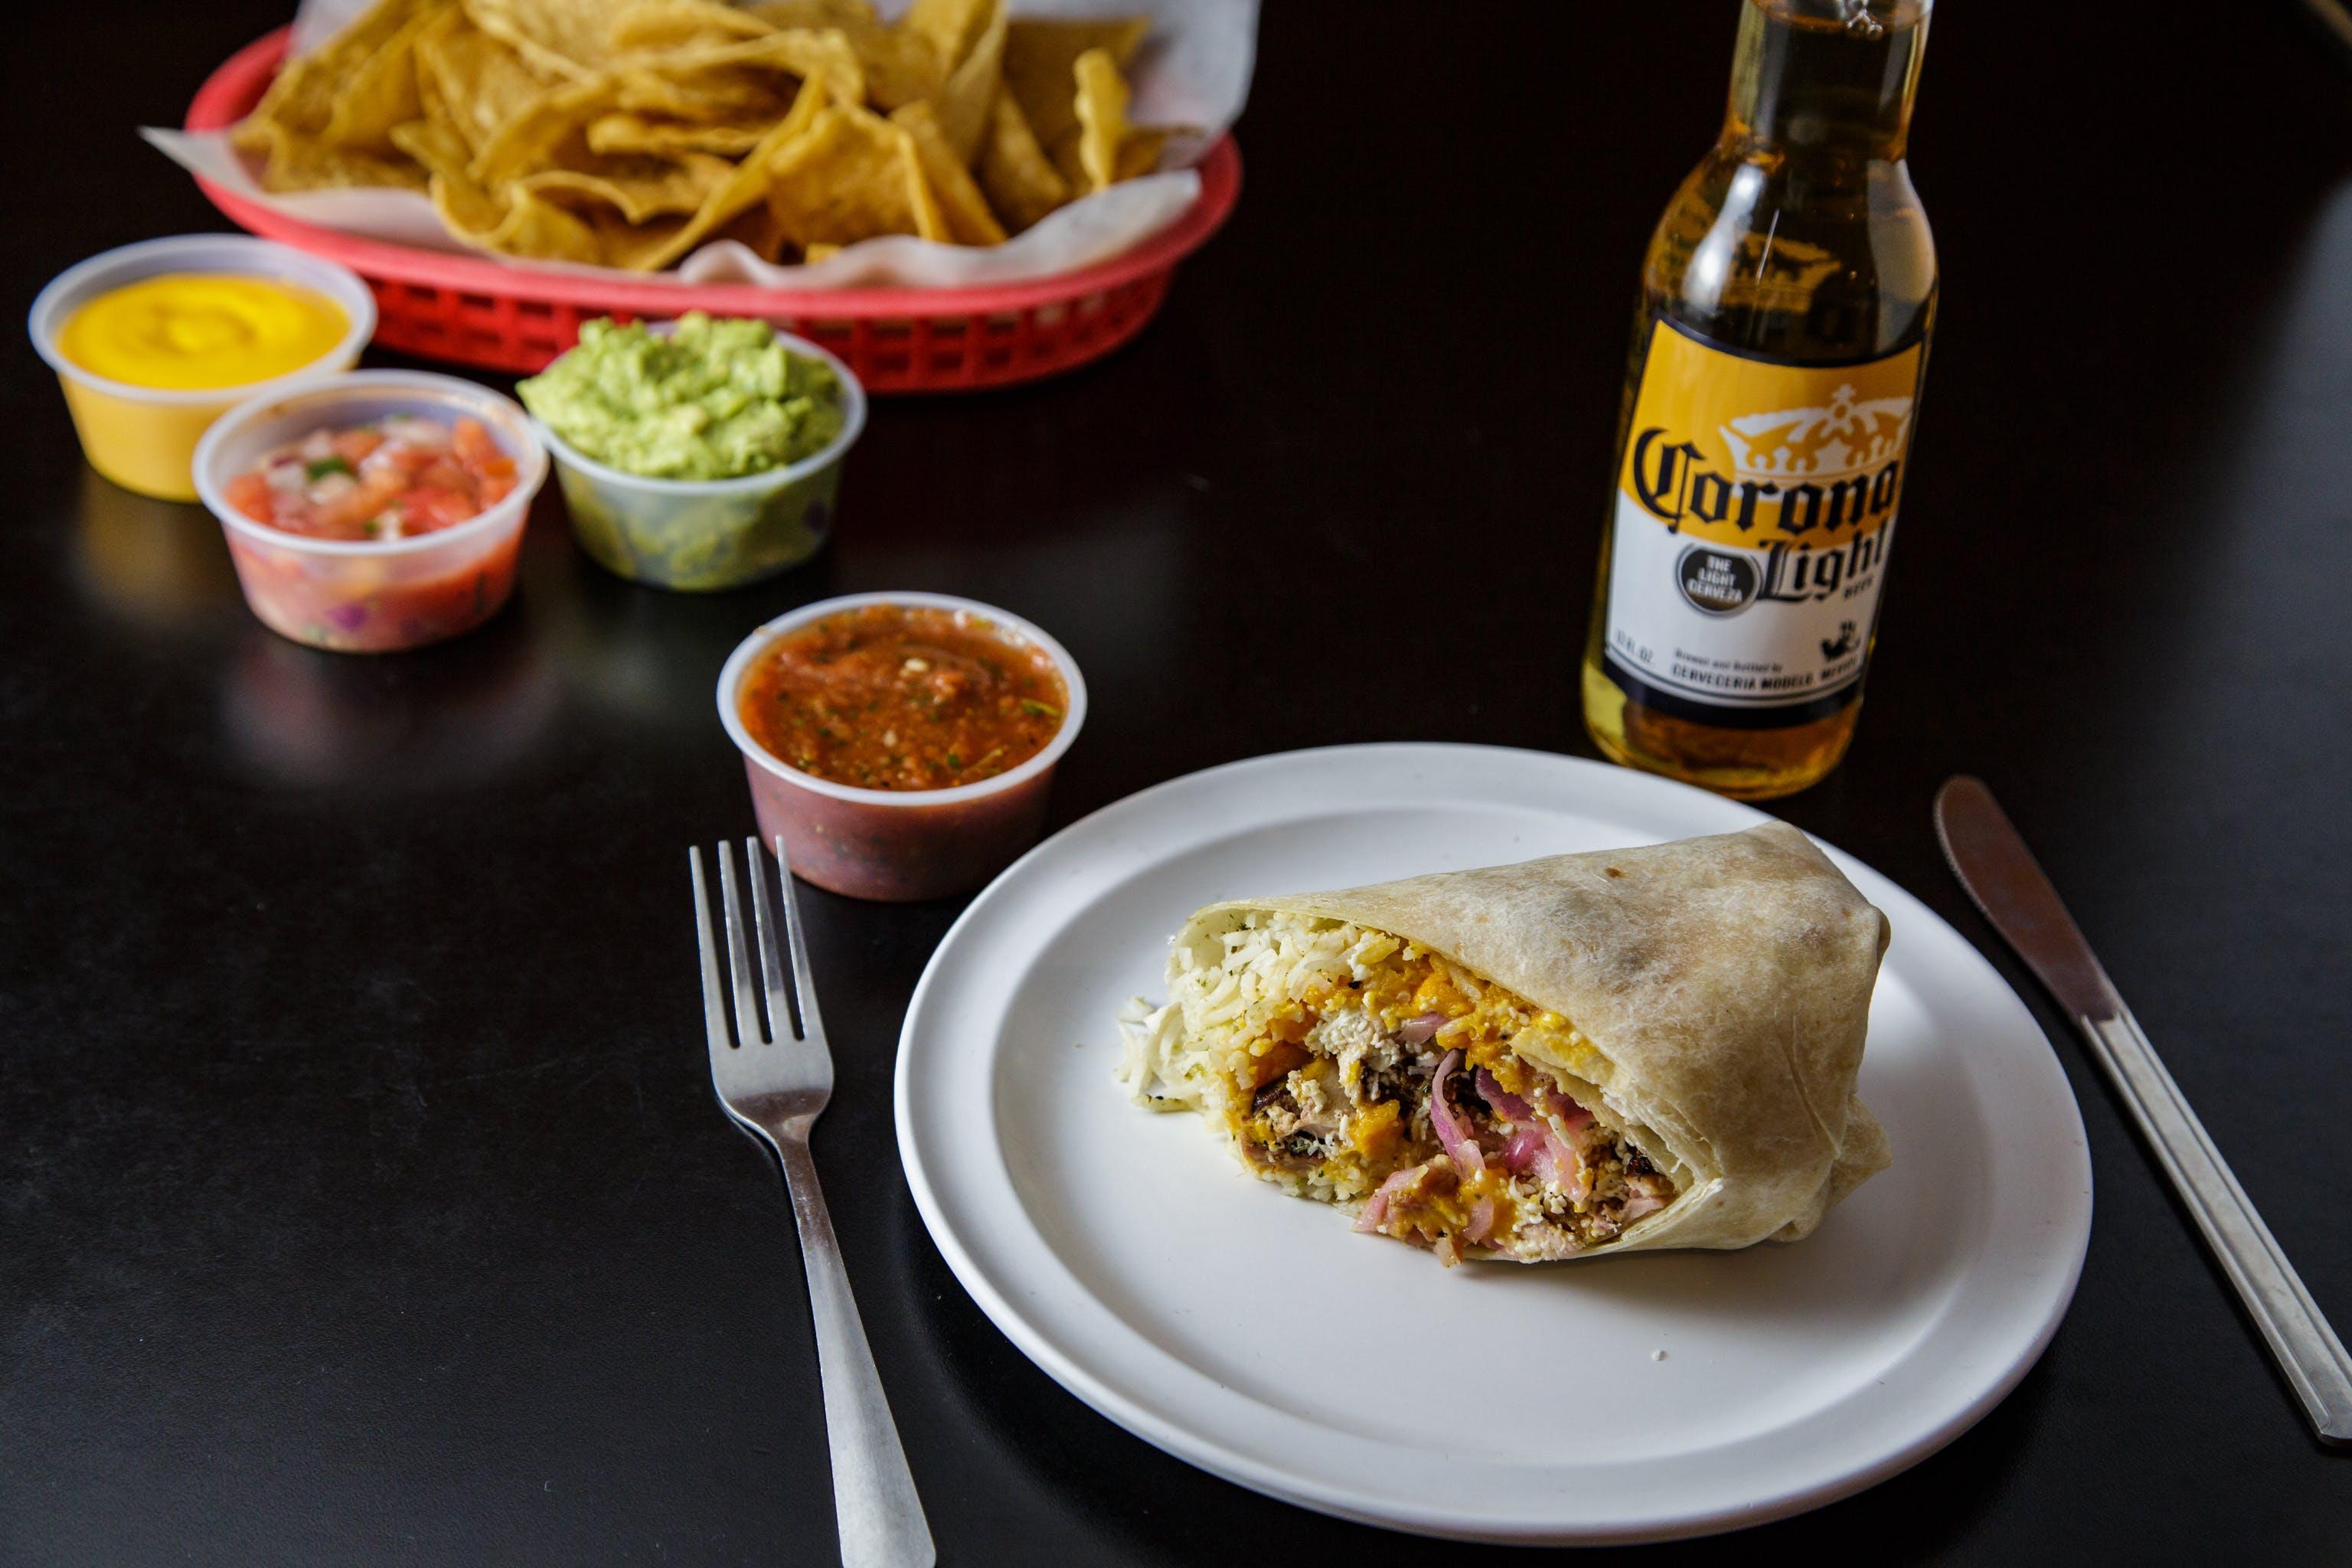 Sheh-meh-neh Burrito from Burrito Drive in Madison, WI